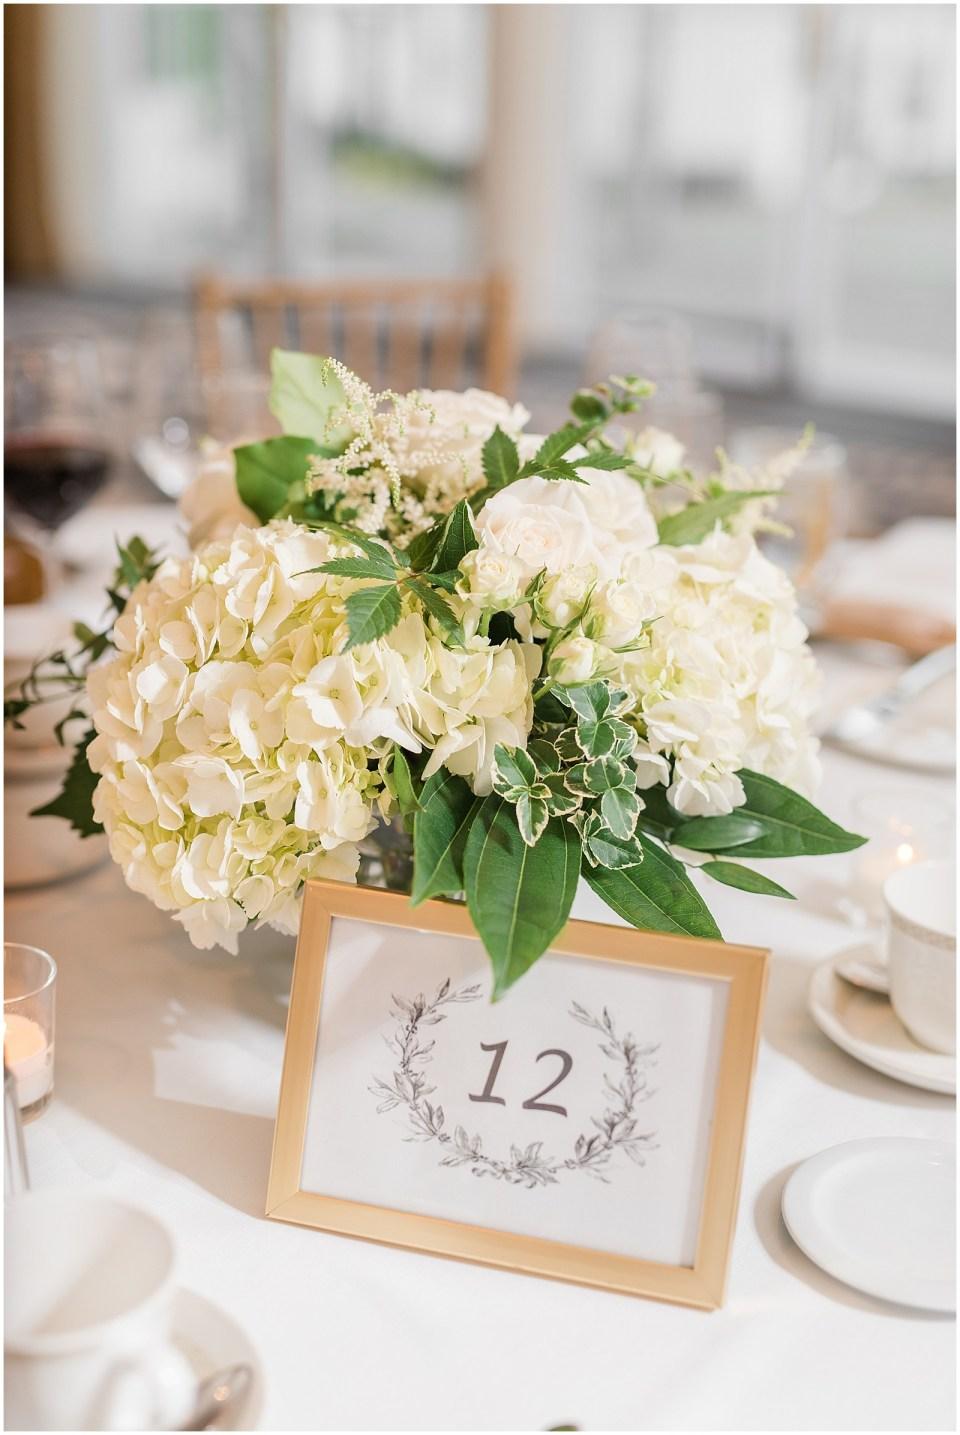 Westwood Country Club Wedding Centerpiece Photo